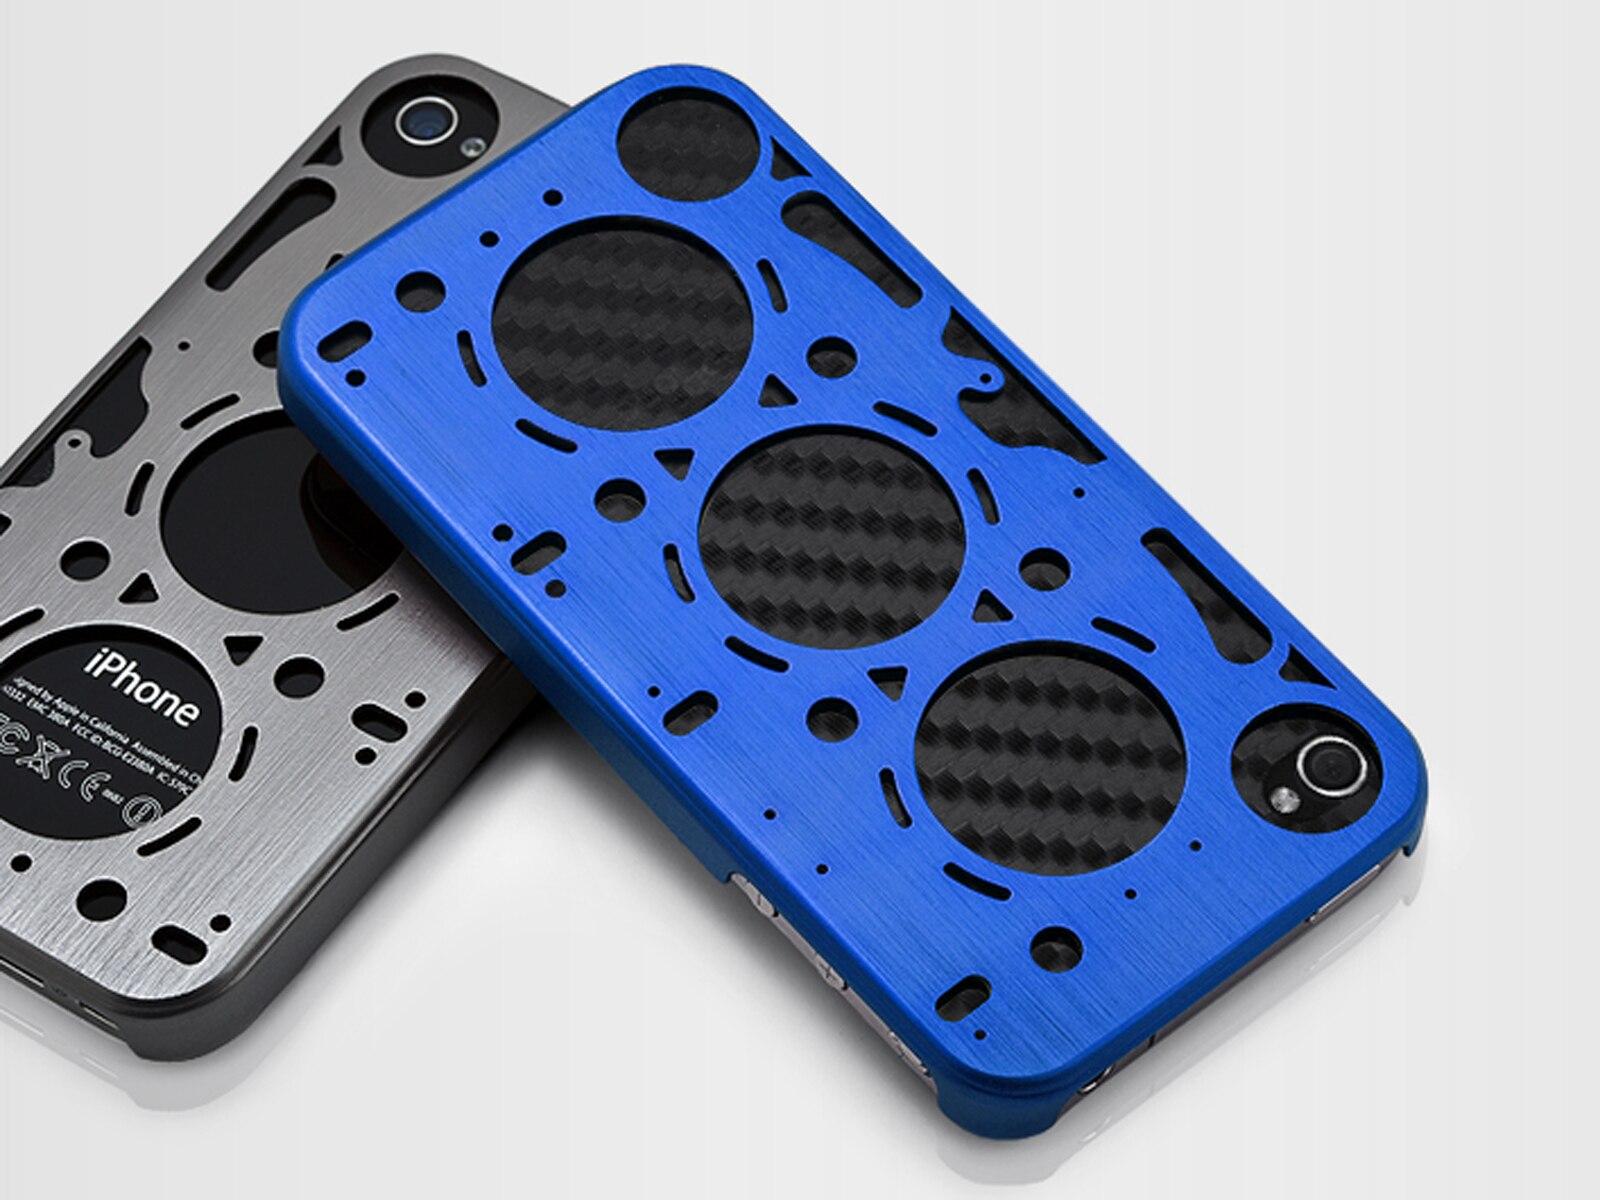 1108-lrmp-01-o-gasket-rally-blue-case-id-america1